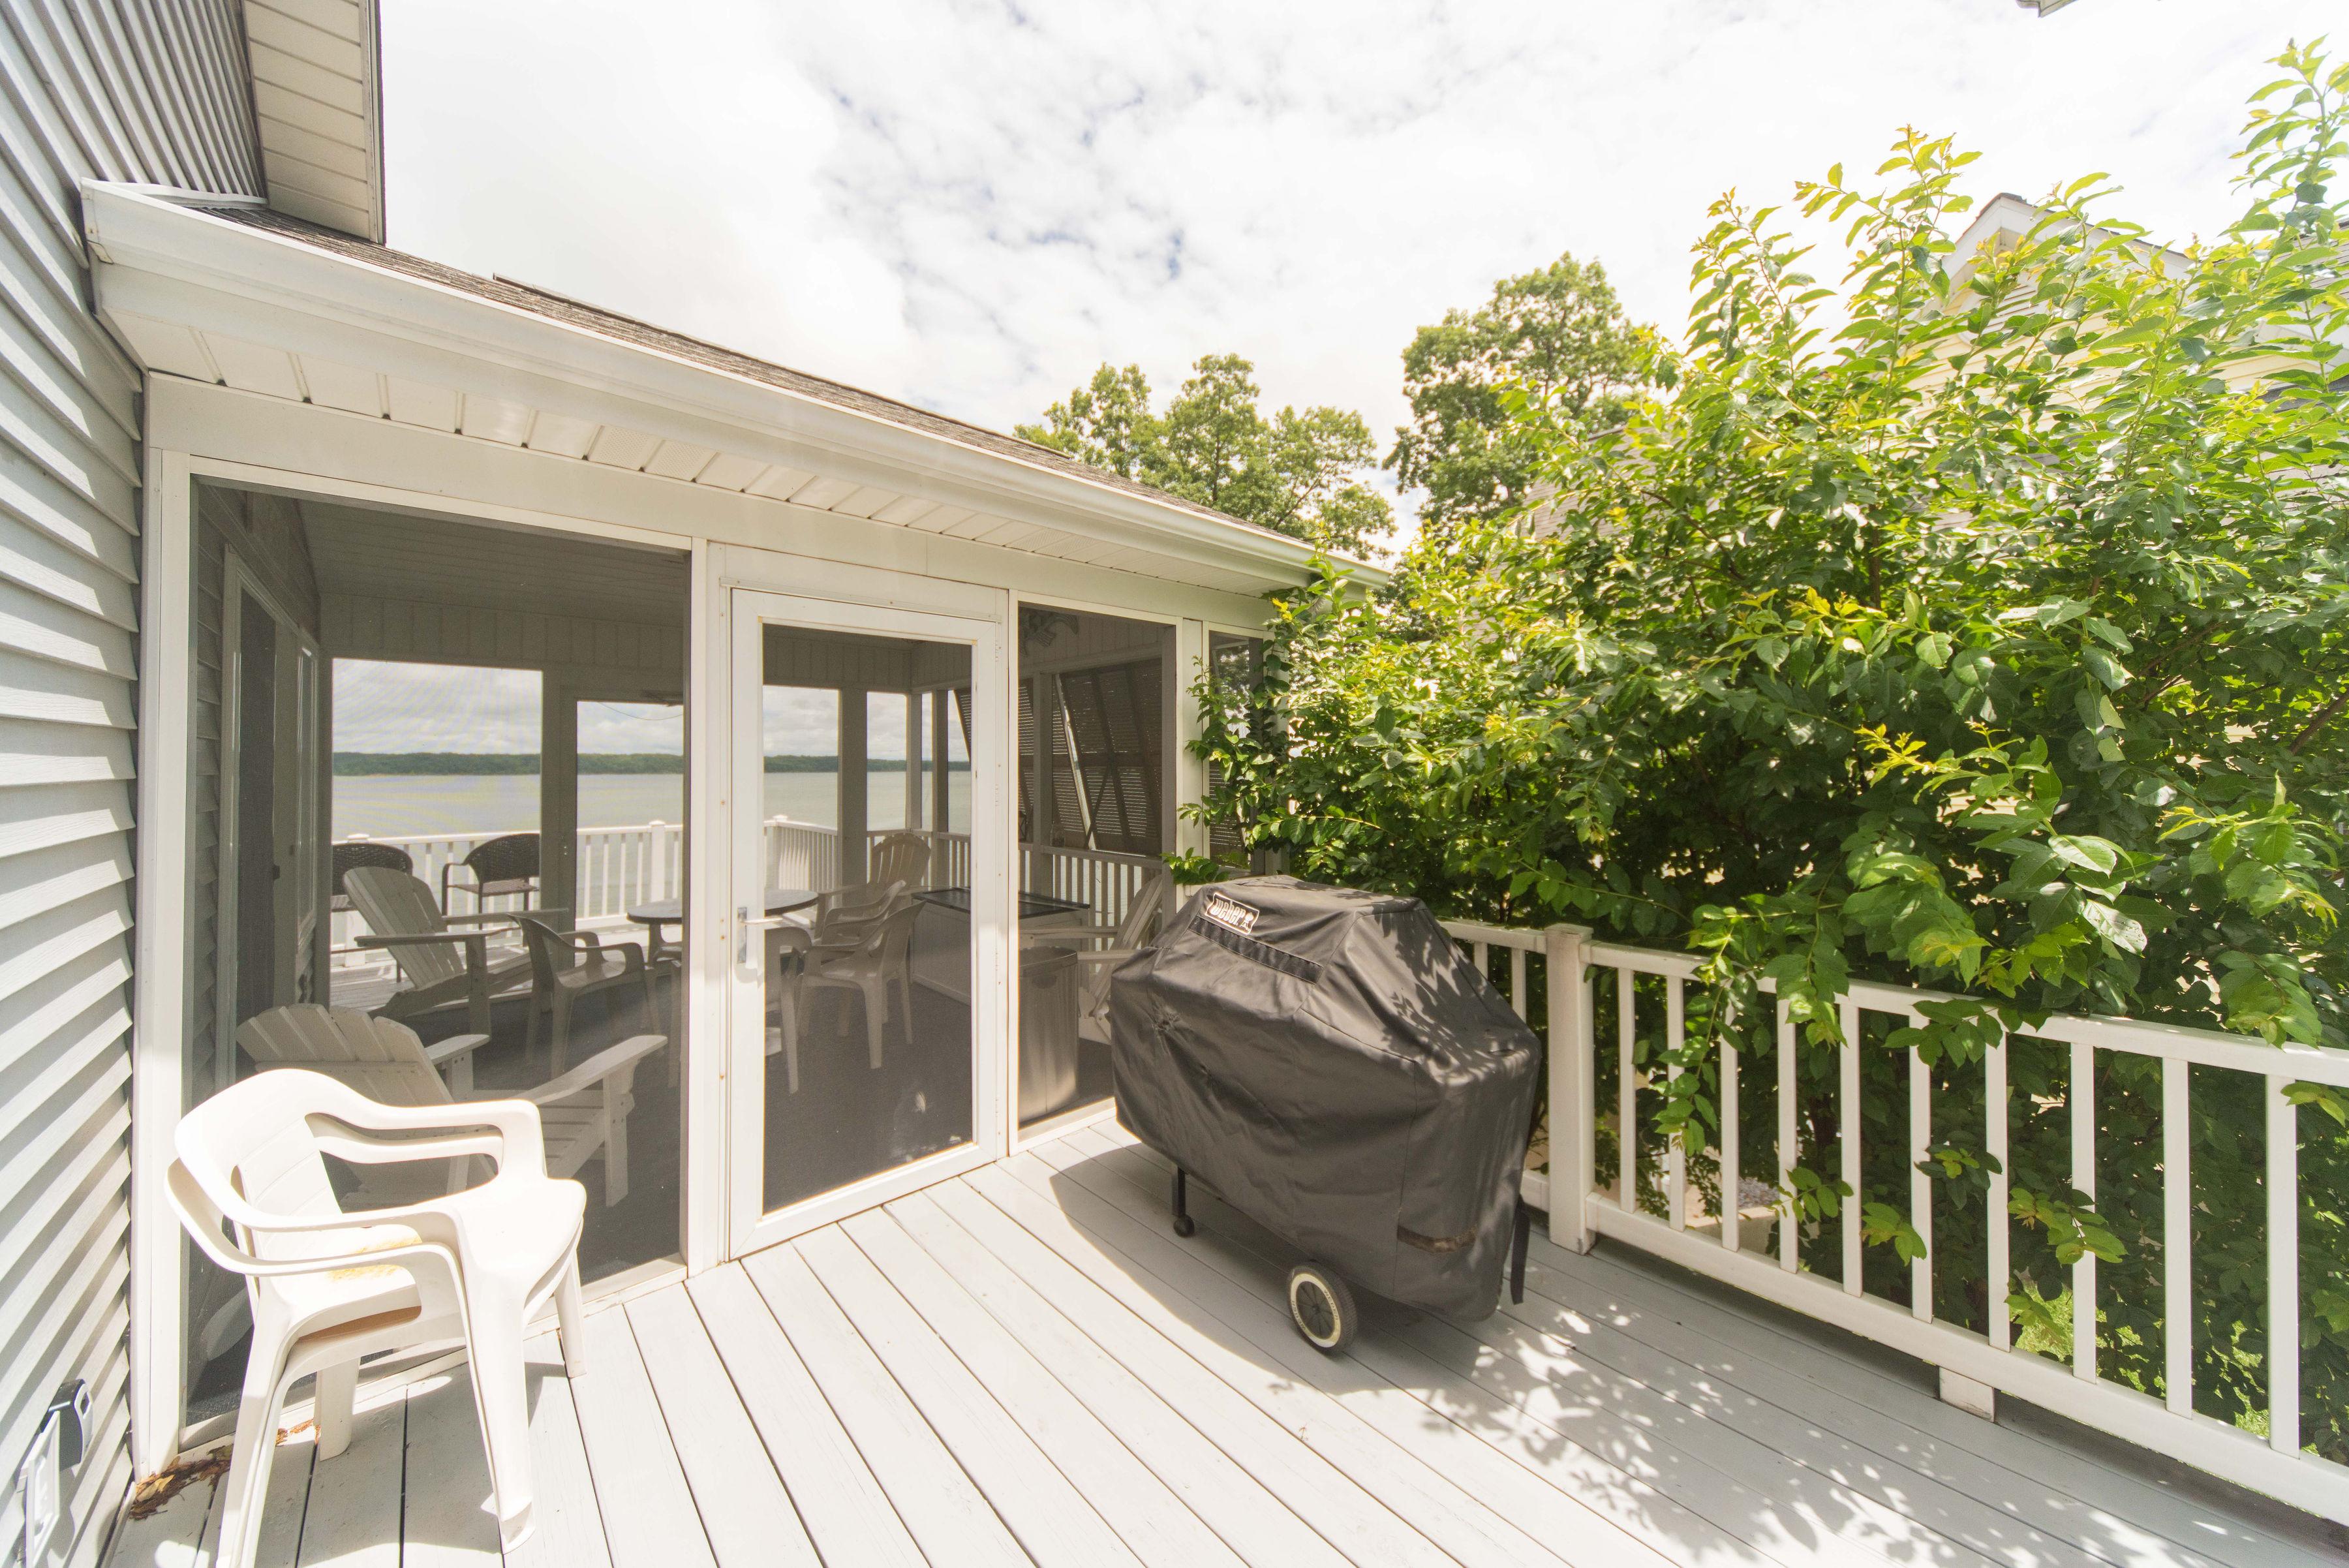 Tremendous Lake Front Luxury 5Bdrm On Kentucky Lake Jz Vacation Interior Design Ideas Clesiryabchikinfo